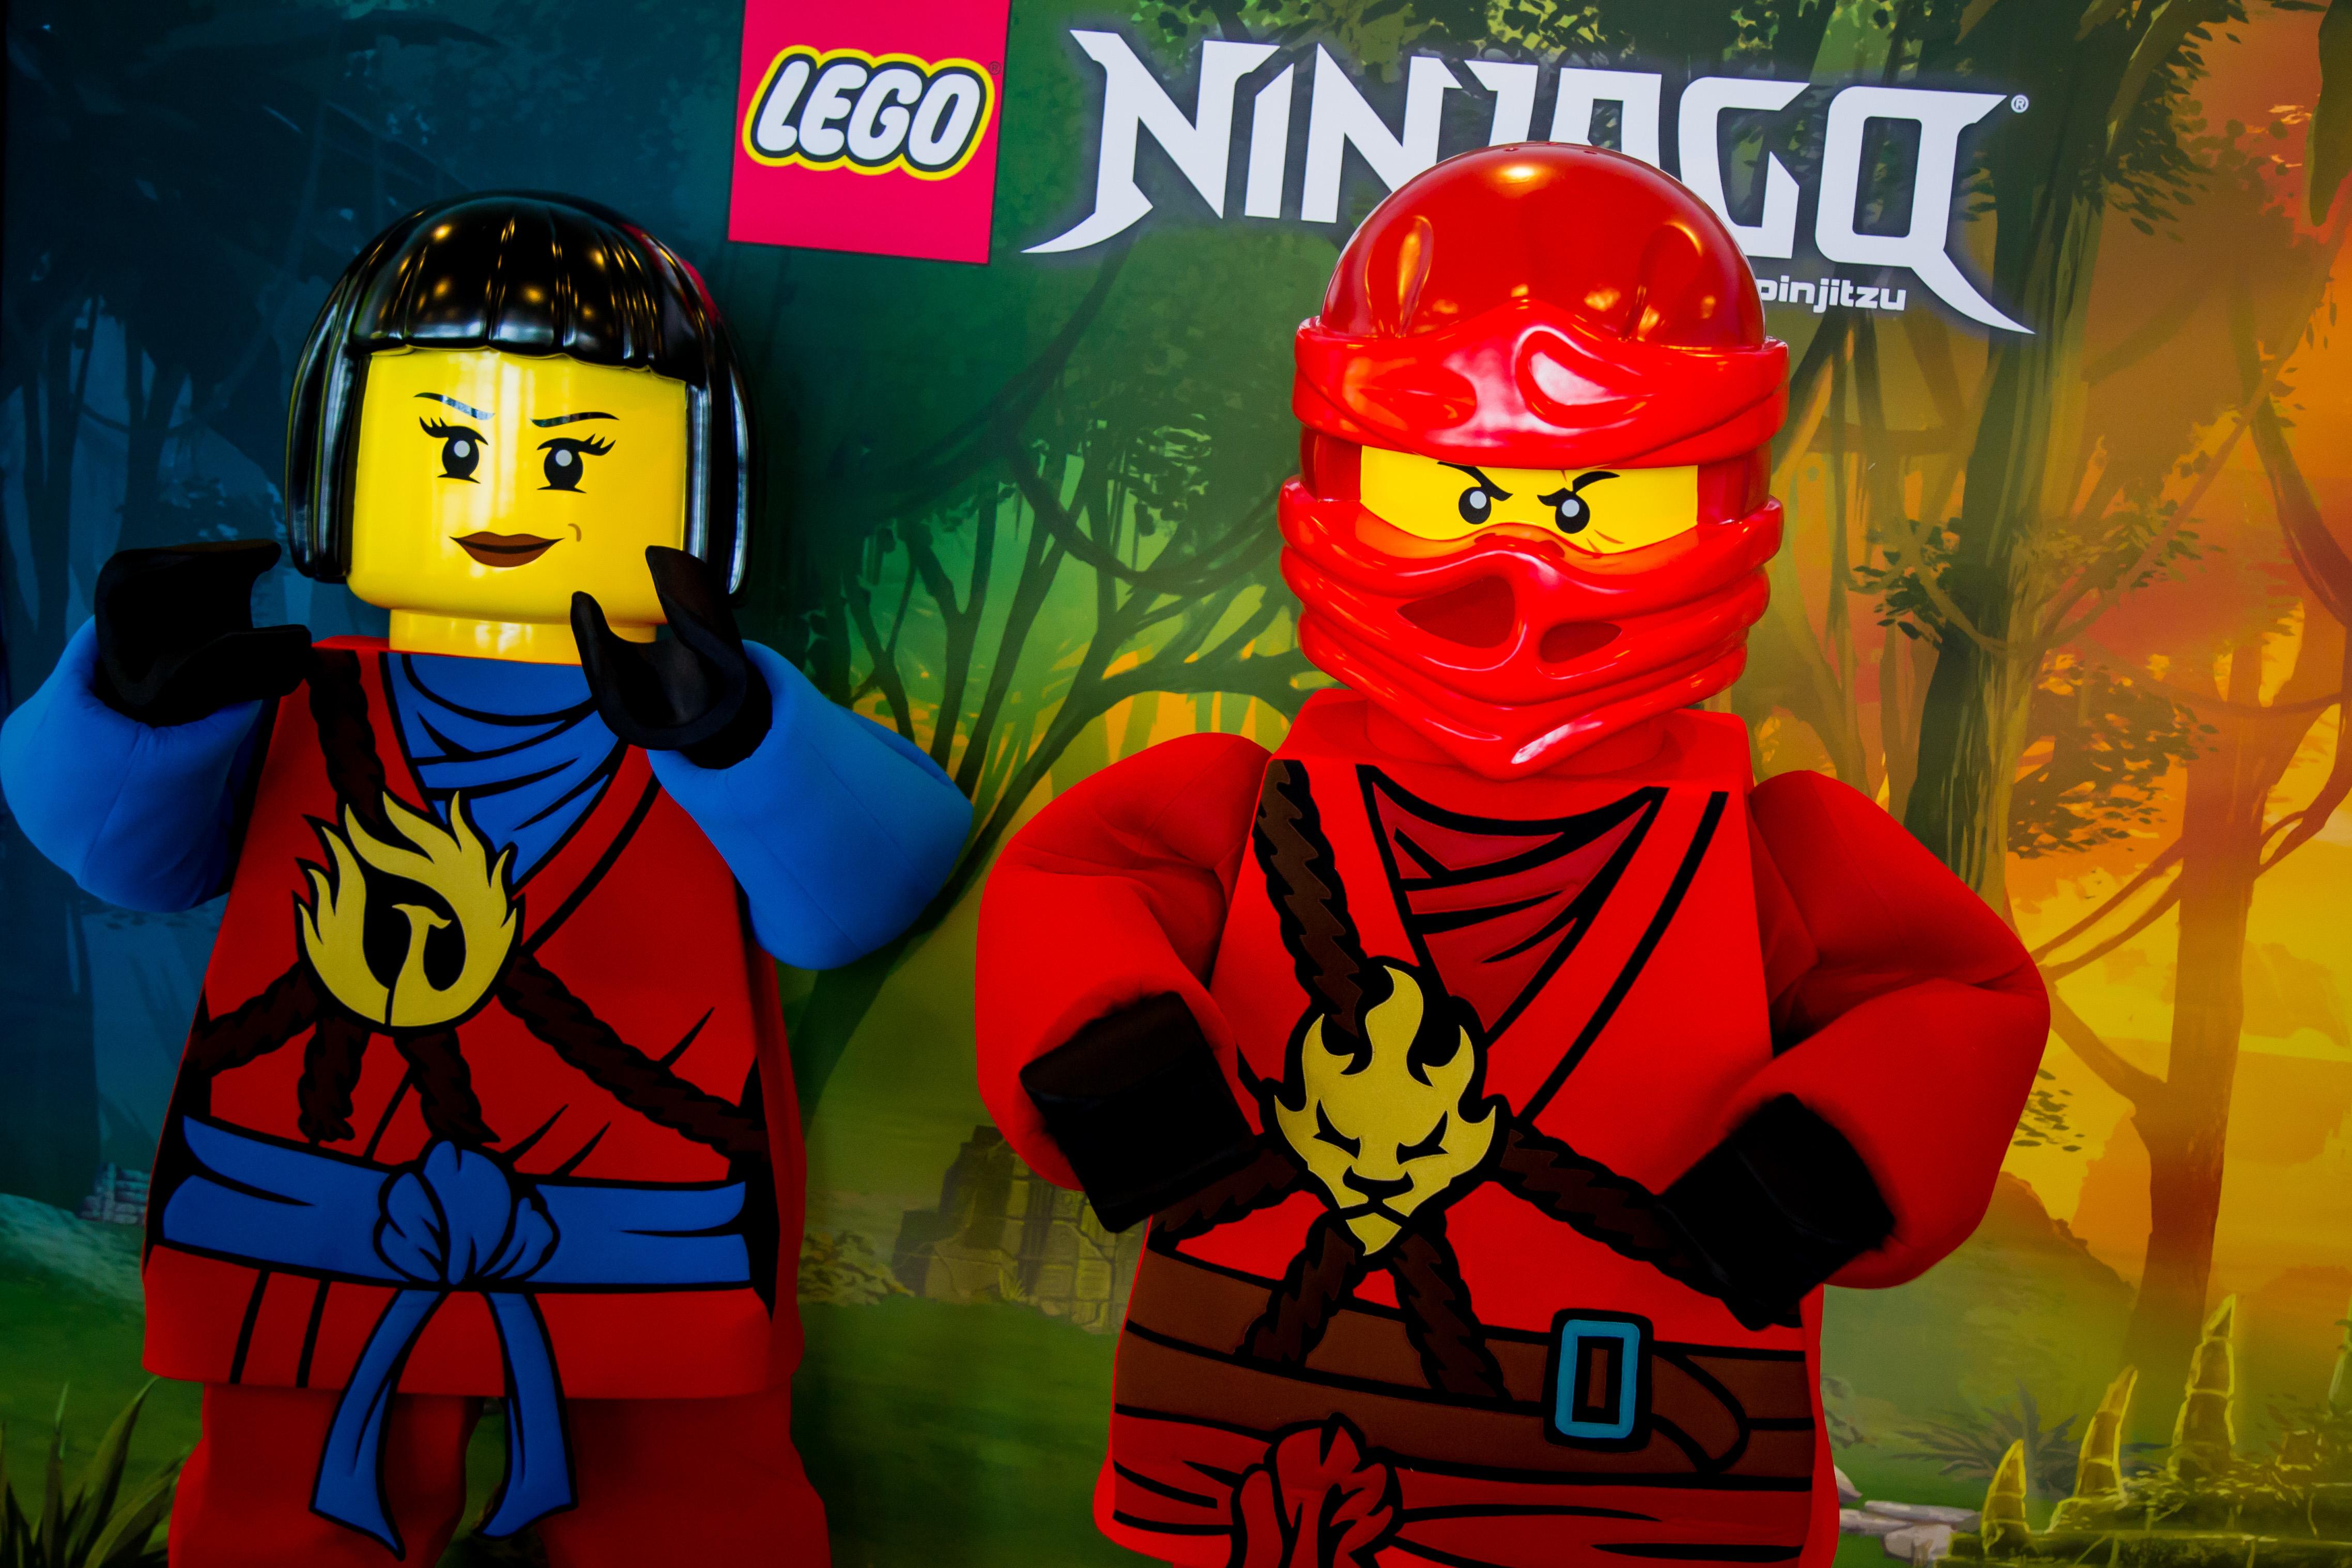 Lego Ninjago characters at Legolanf Florida